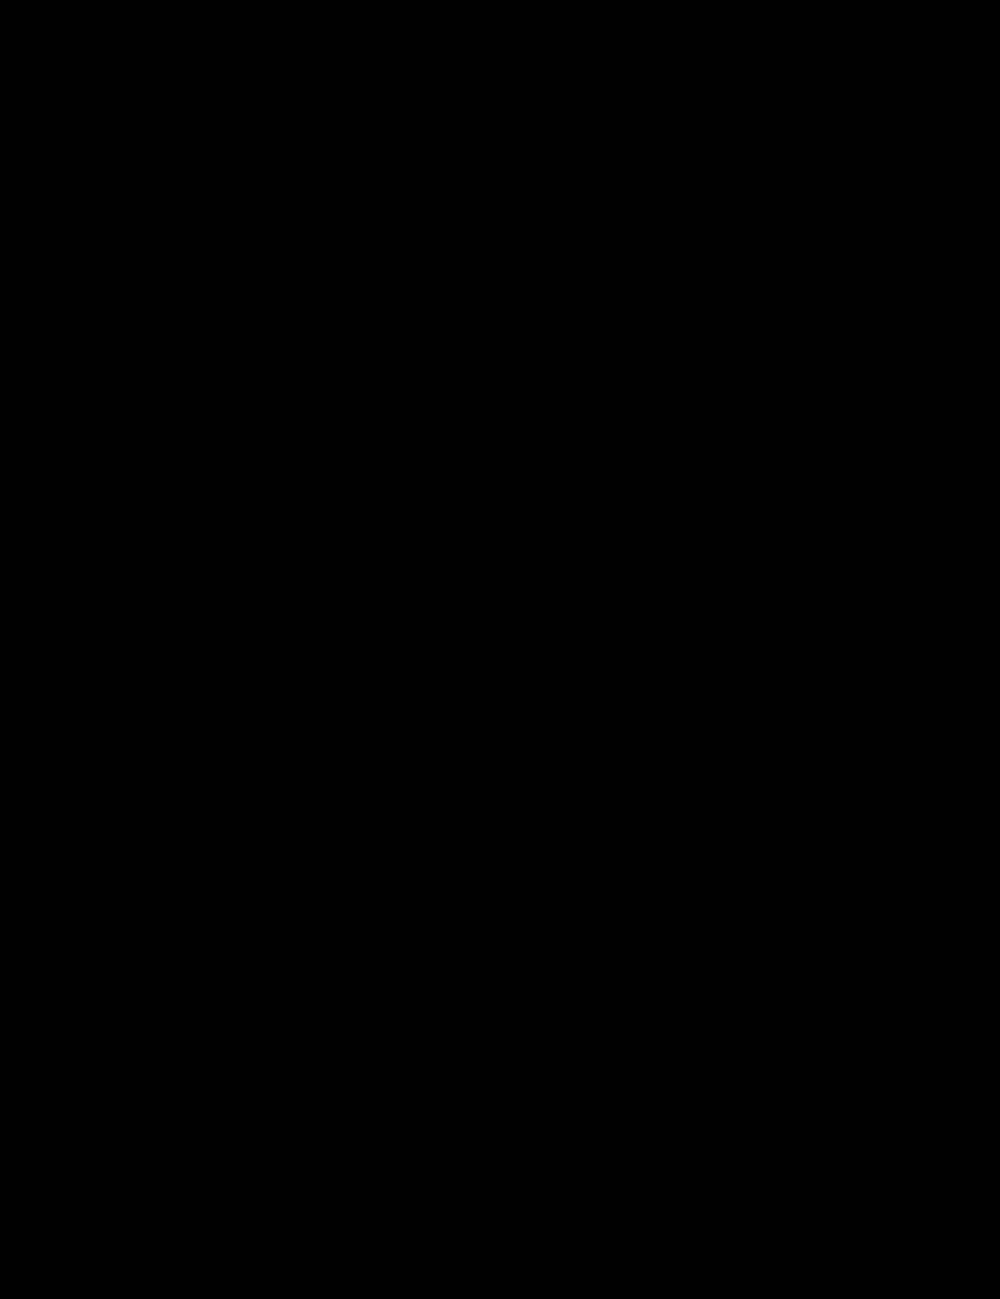 Conseil profil rencontre